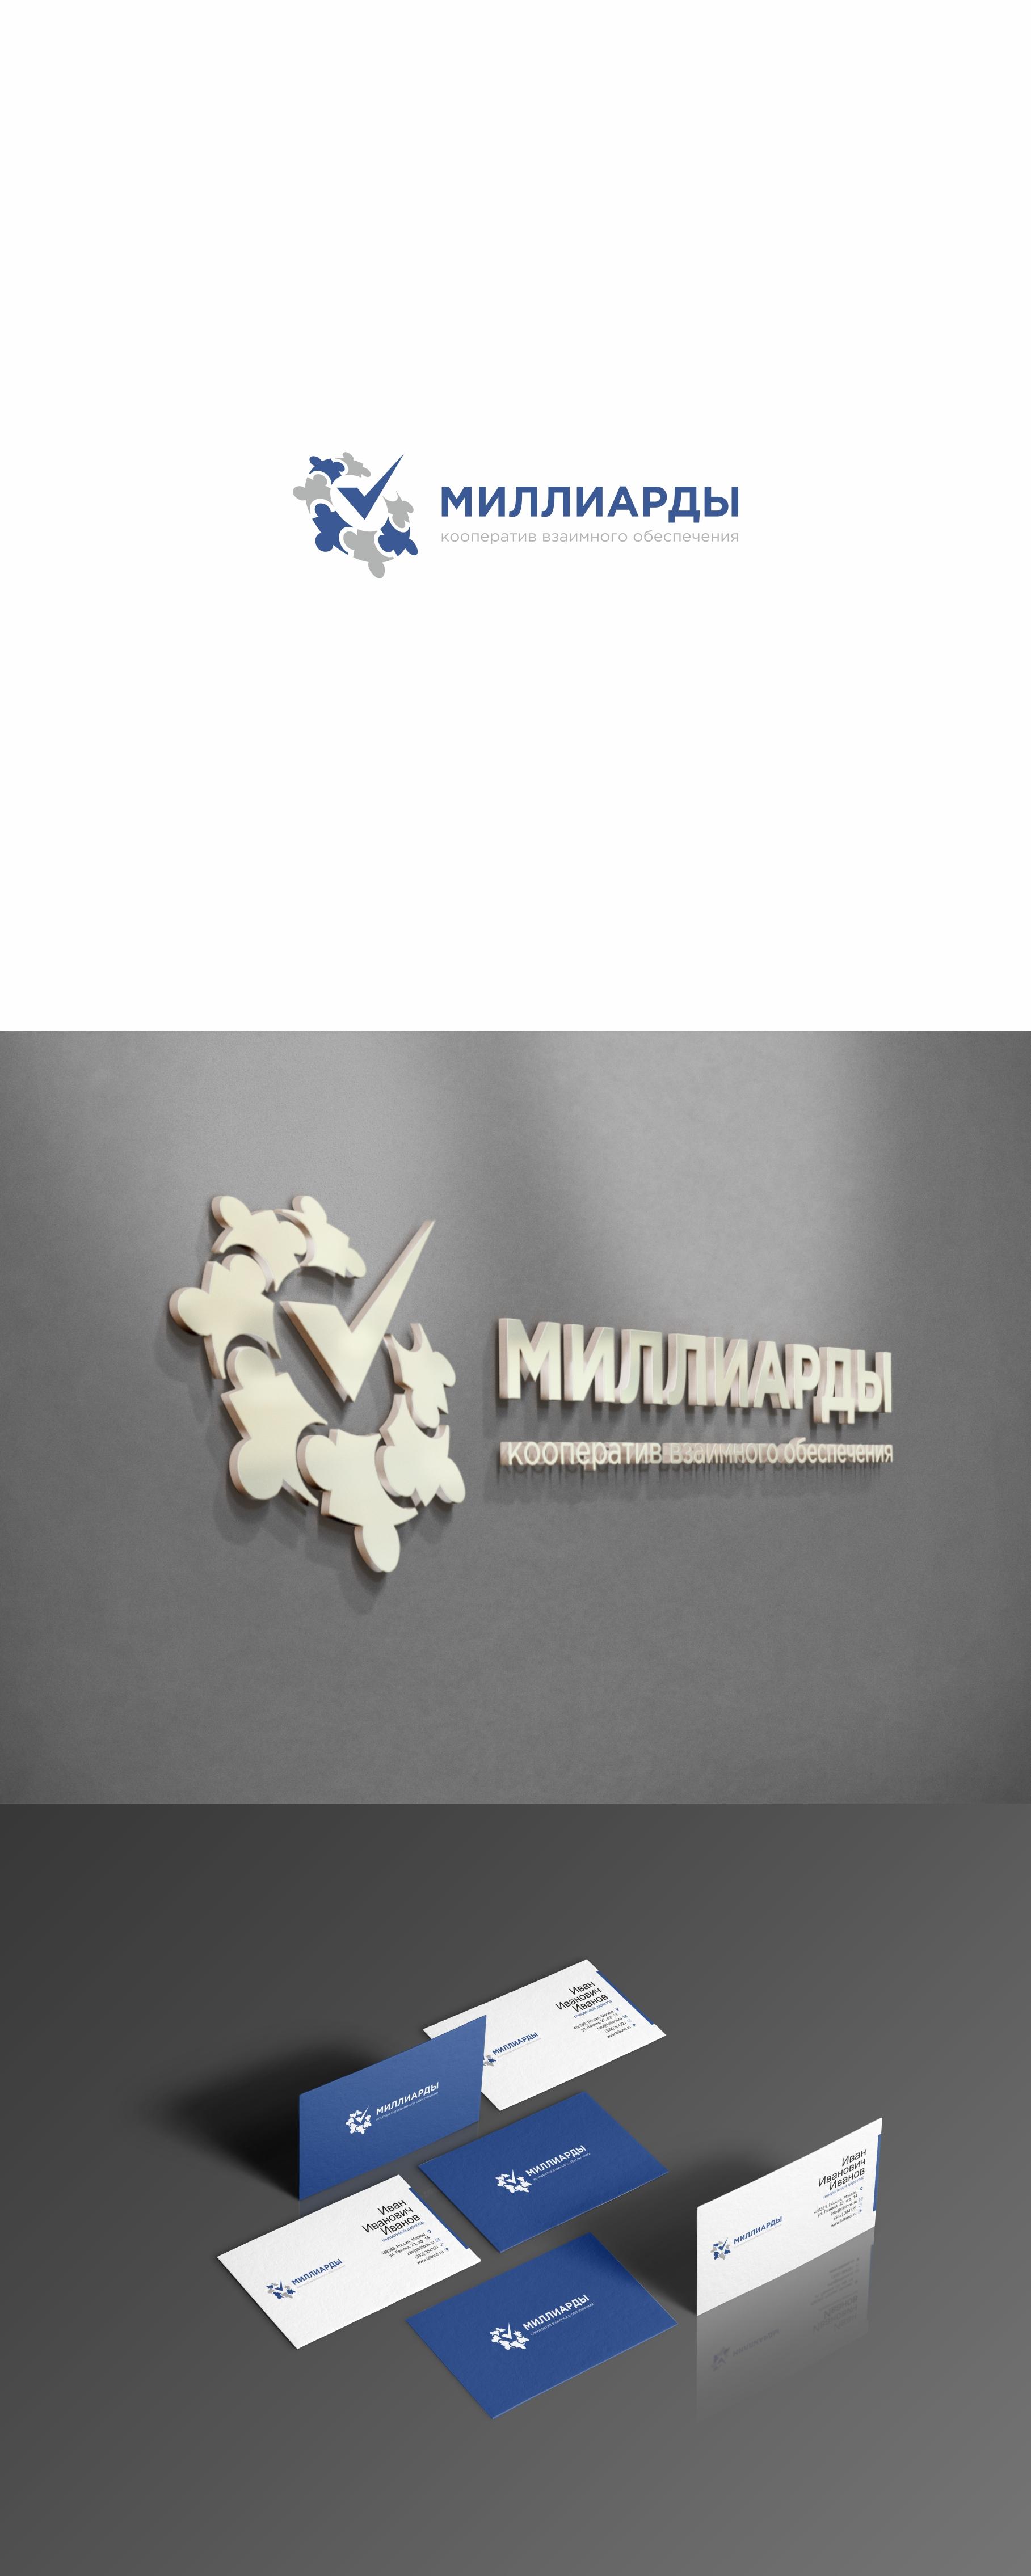 Создание логотипа фото f_8355e4129767c328.jpg